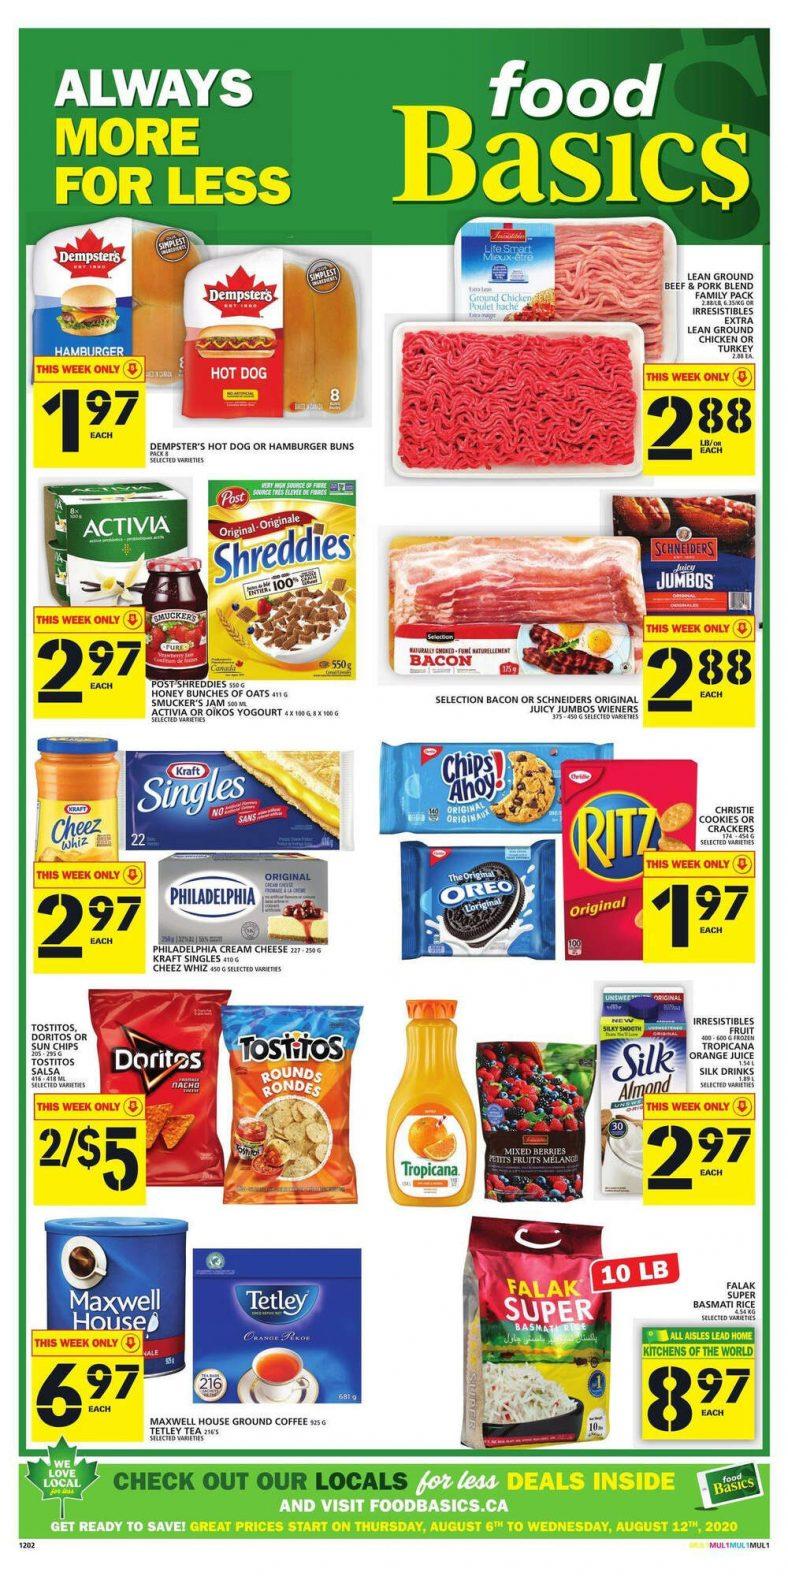 01 Food Basics Flyer August 6 August 12 2020